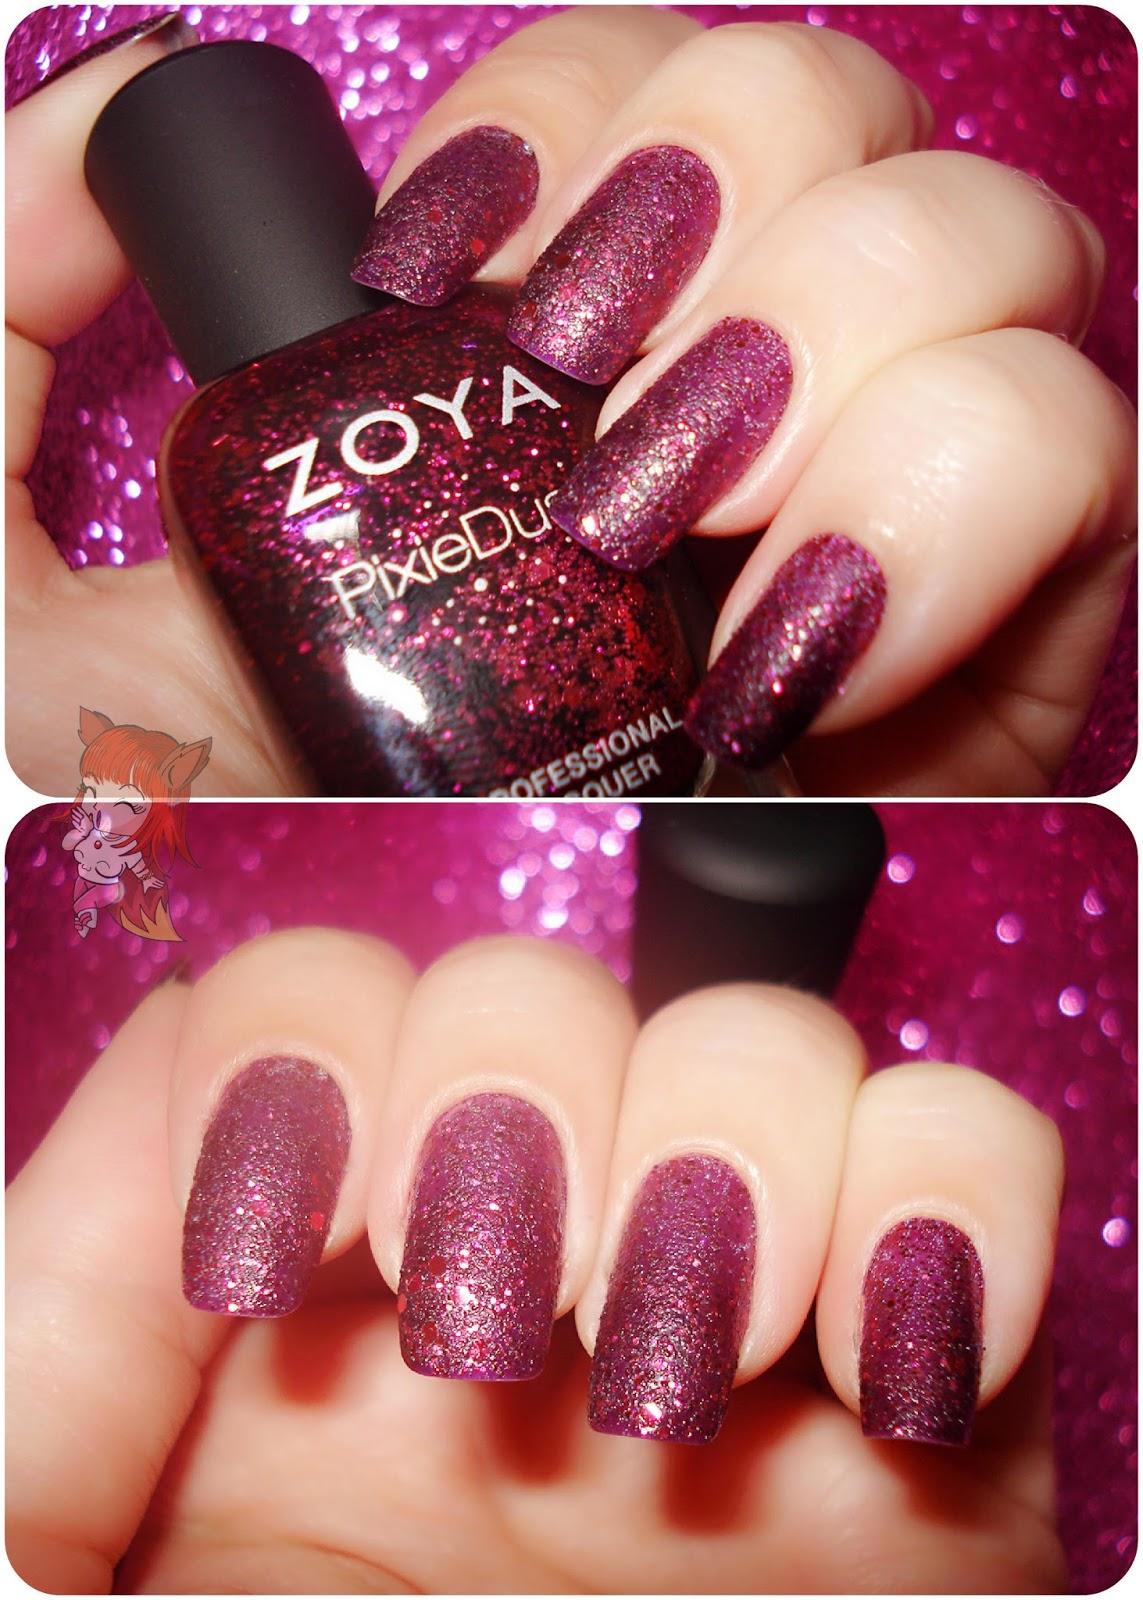 Esmalte Zoya Pixie Dust :: Noir